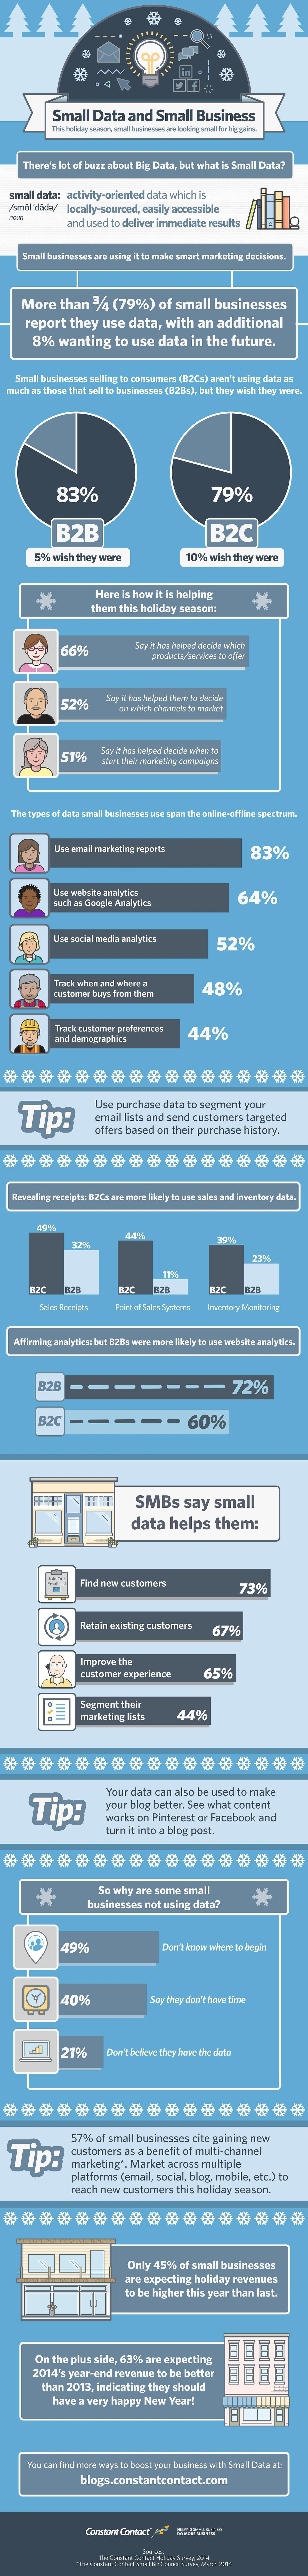 Small-Data-Infographic.jpg